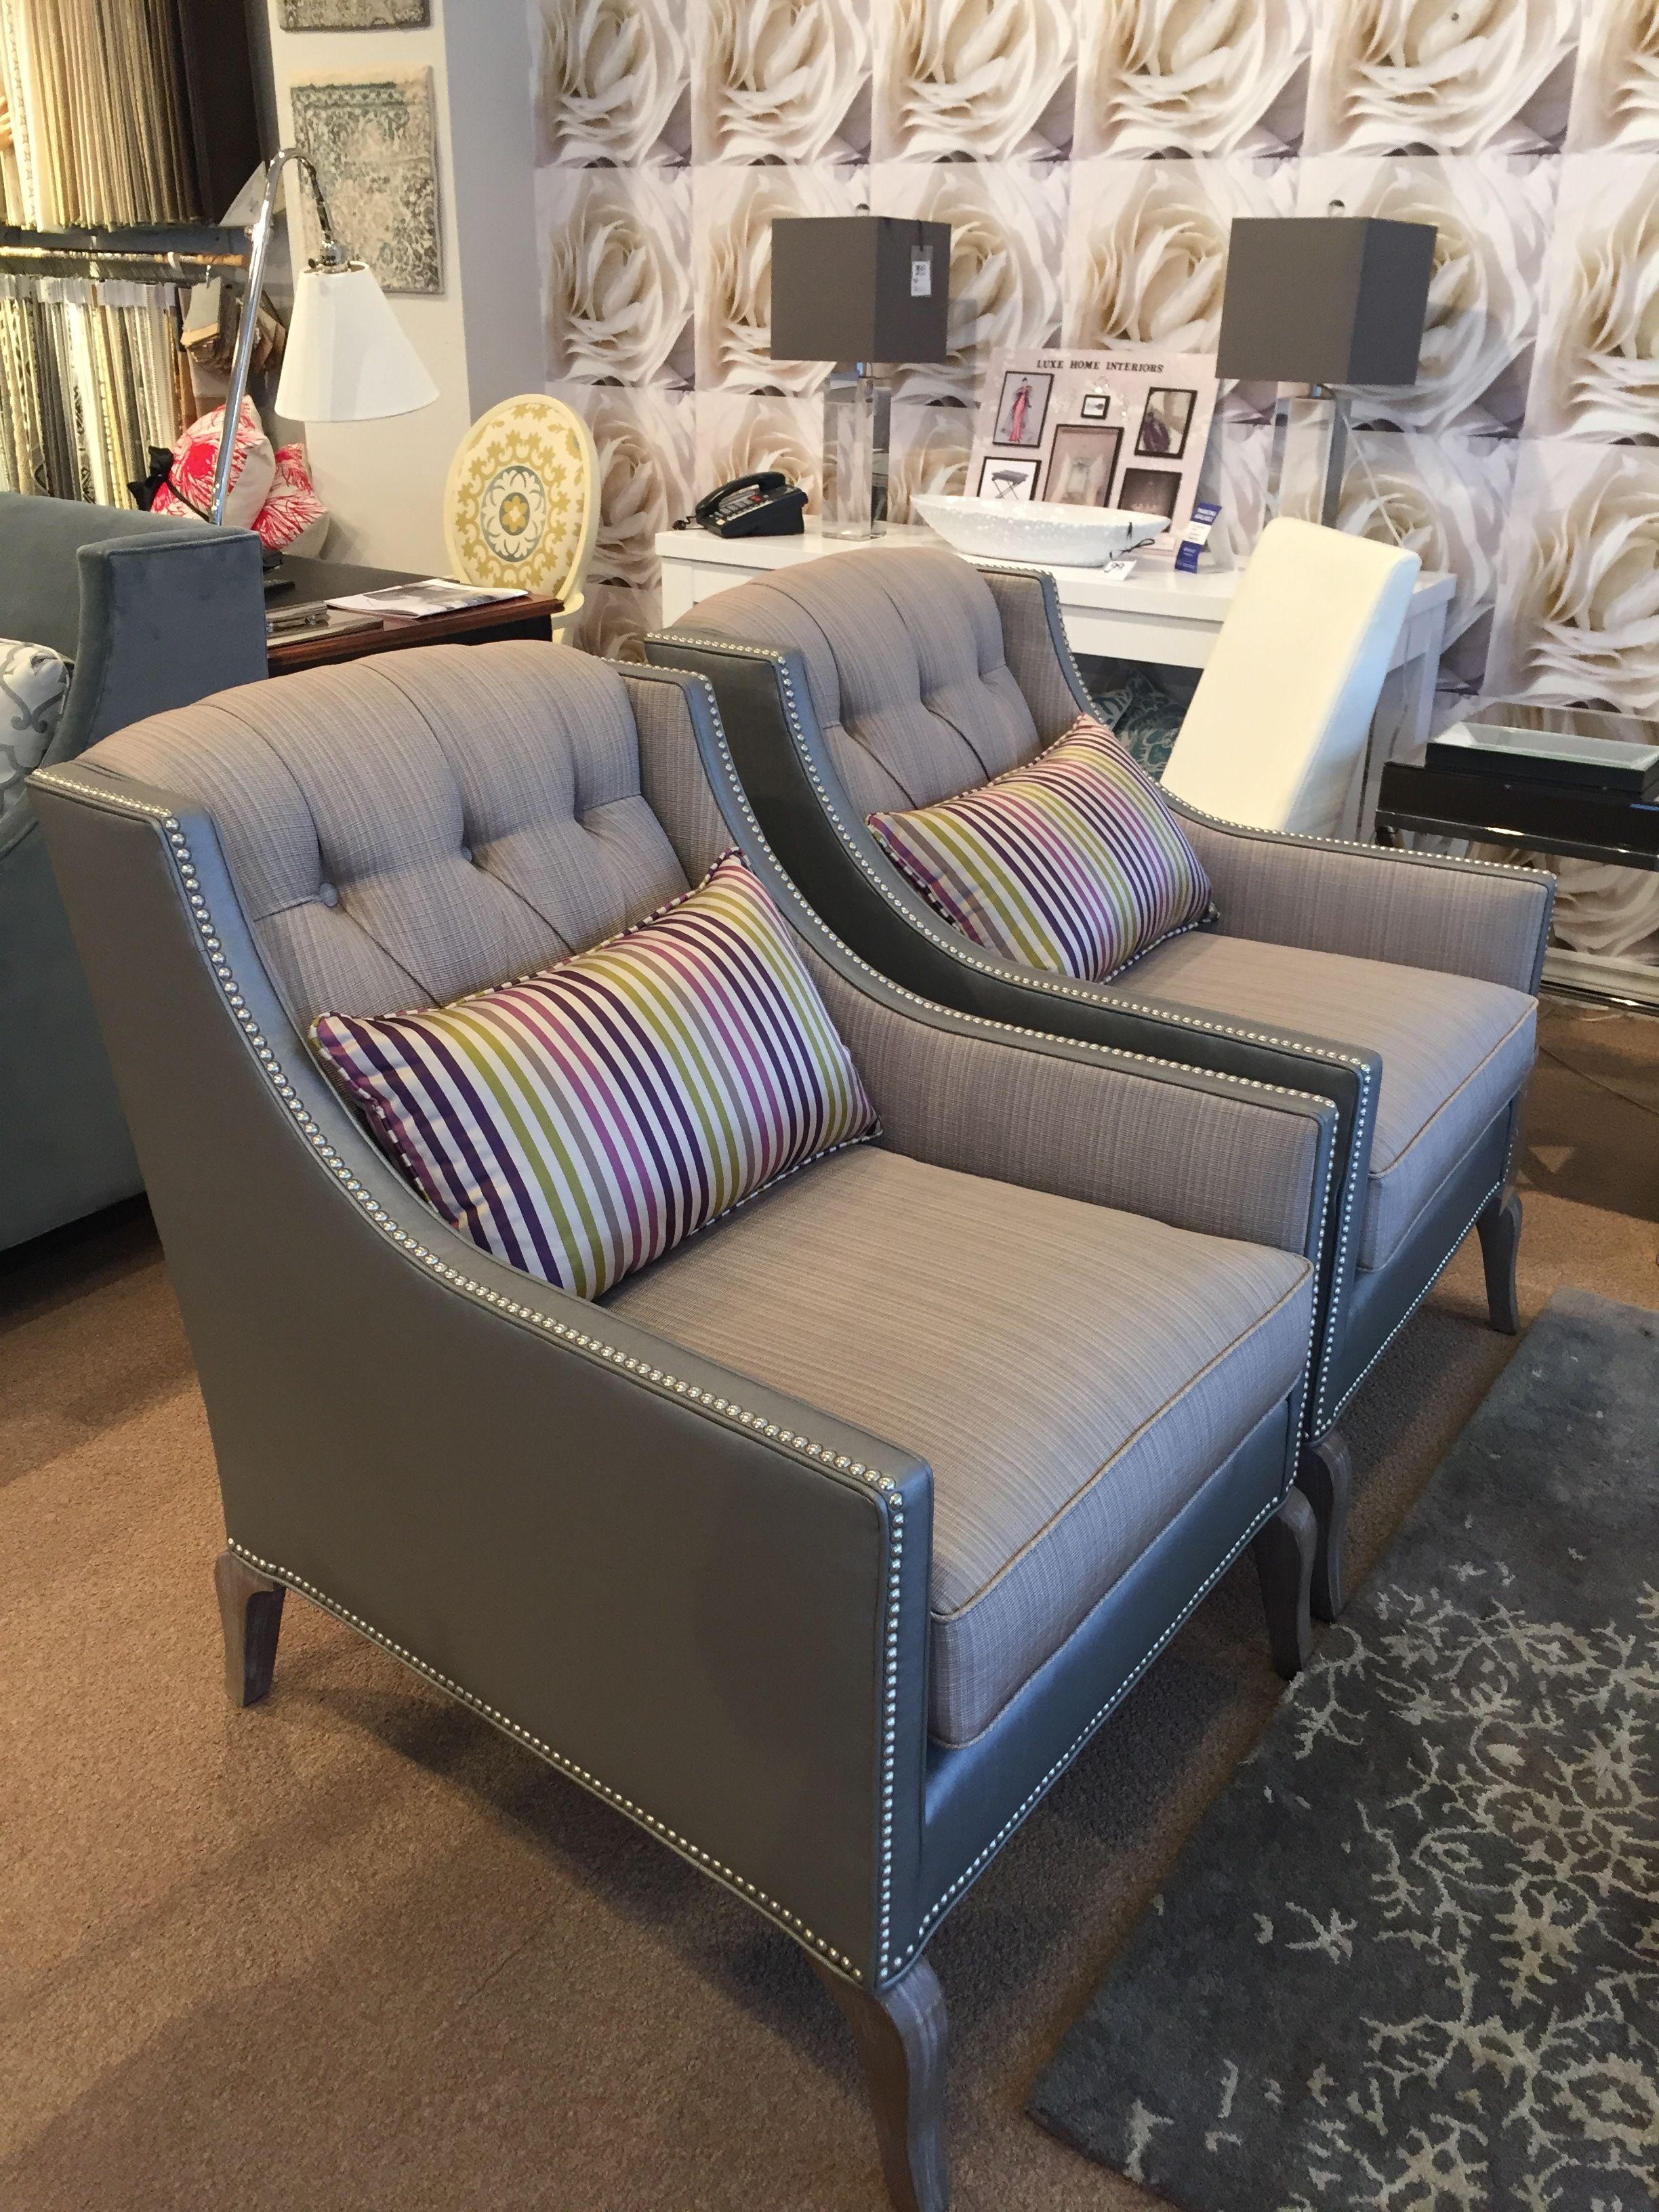 Paul schatz furniture portland or  Luxe Home Interiors Ottawa luxeottawa  Chairs  Pinterest